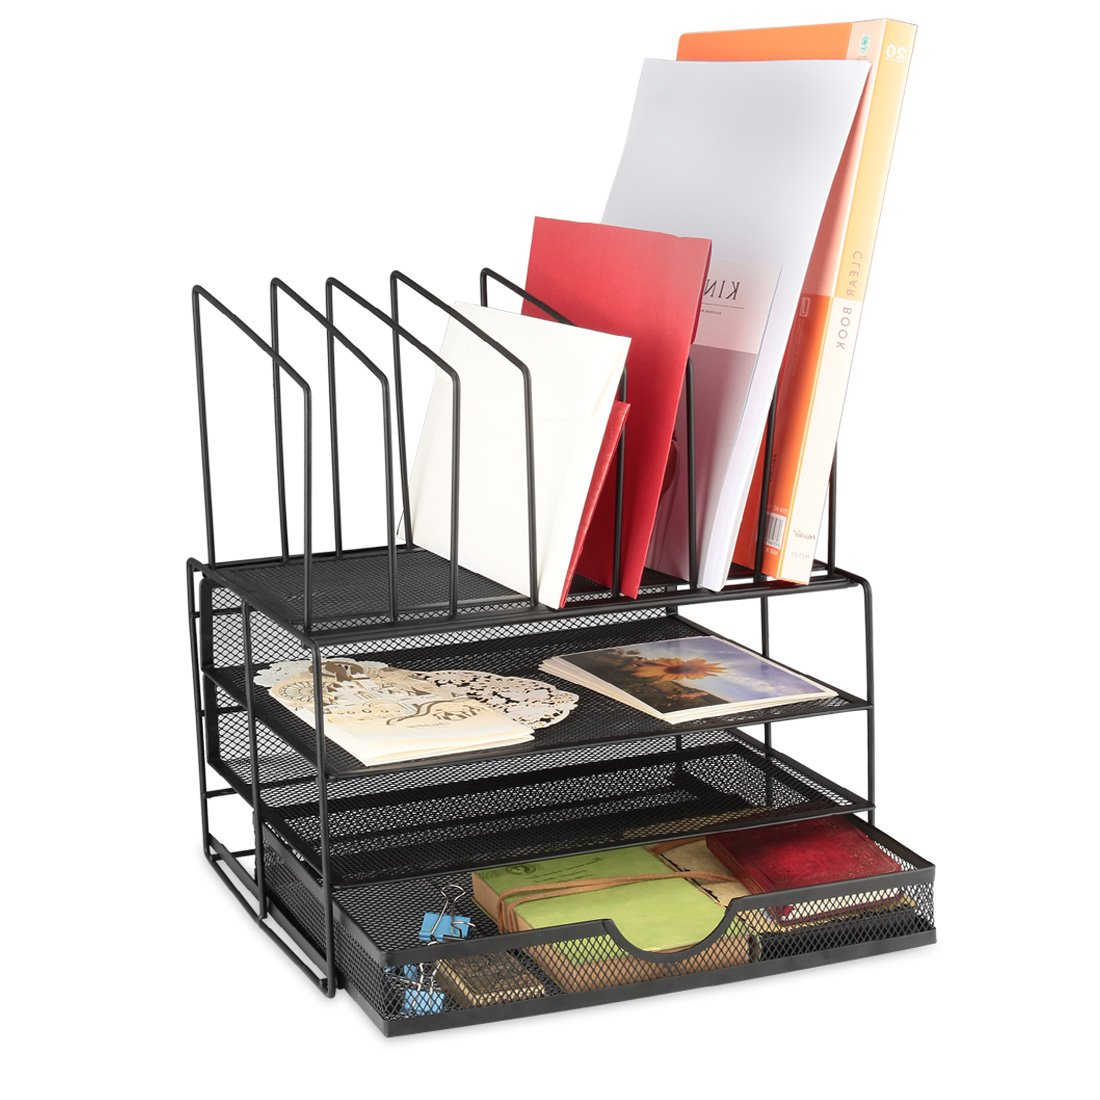 Samstar 3 Tier Desk Paper Organizer Letter Tray with Sliding Drawer and 7 Upright Sections,Office Desktop File Organizer Mail Sorter, Black